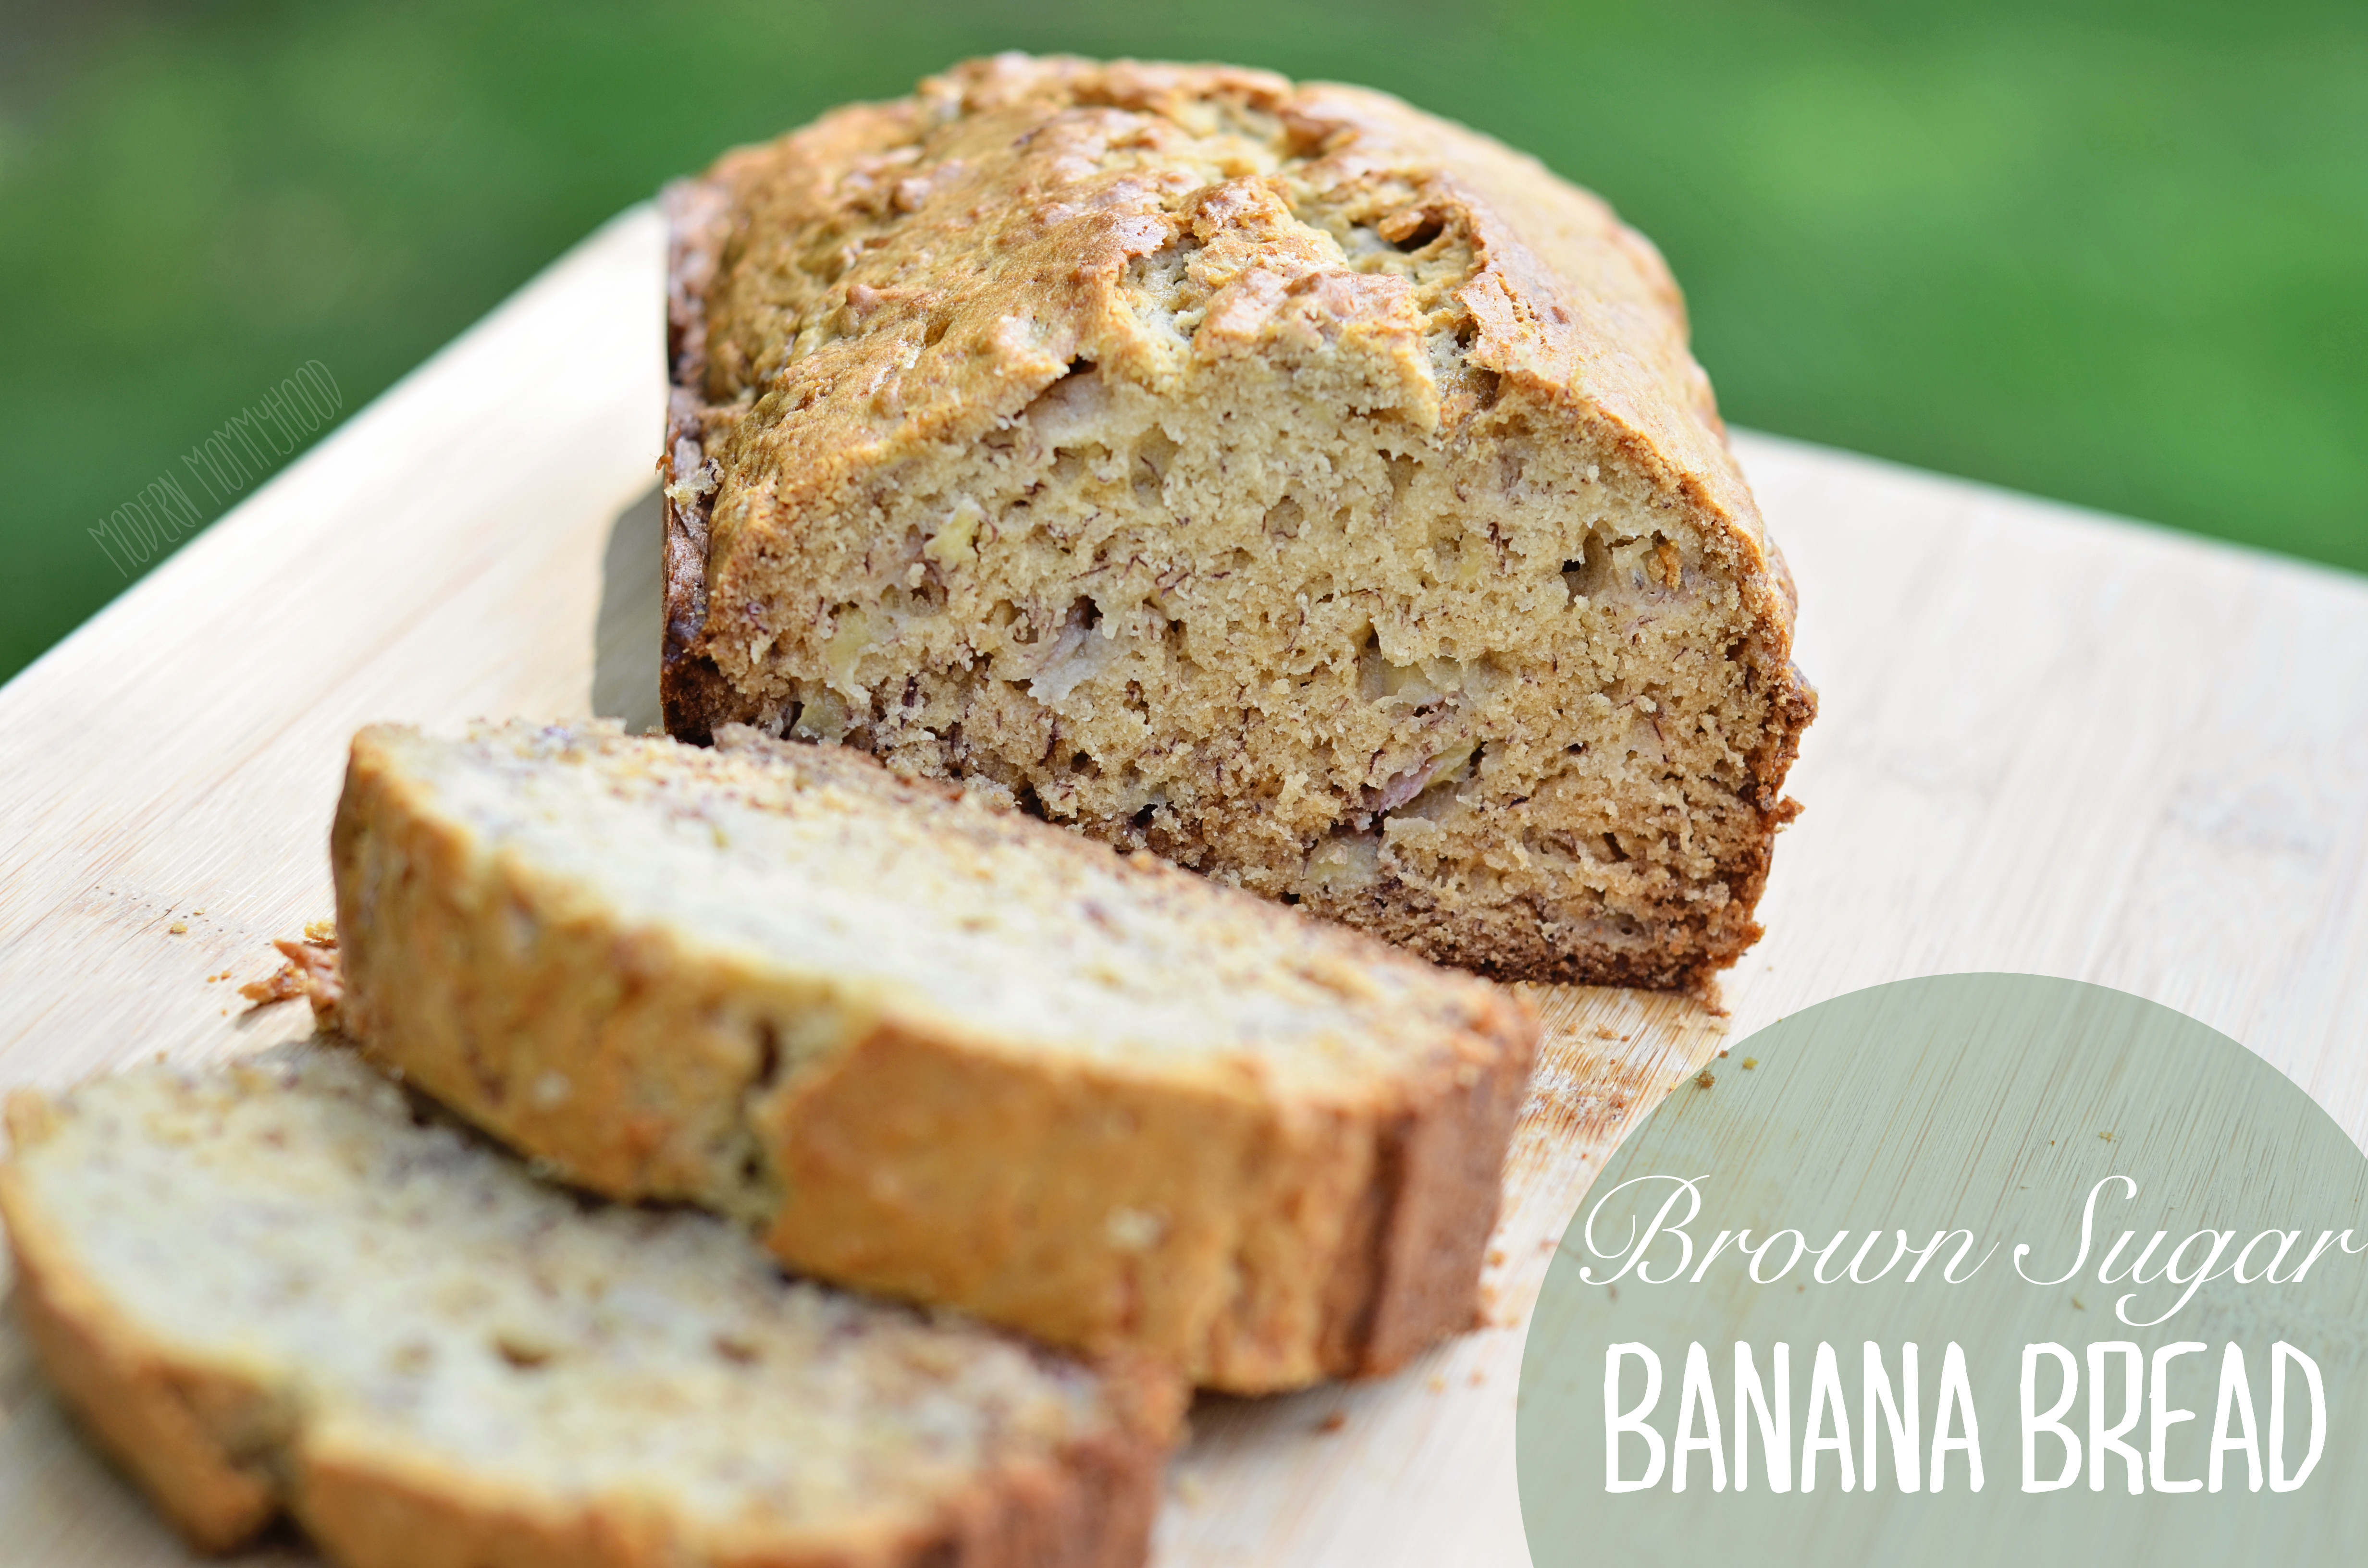 Banana Bread Recipe With Brown Sugar  Brown Sugar Banana Bread Modernly Morgan